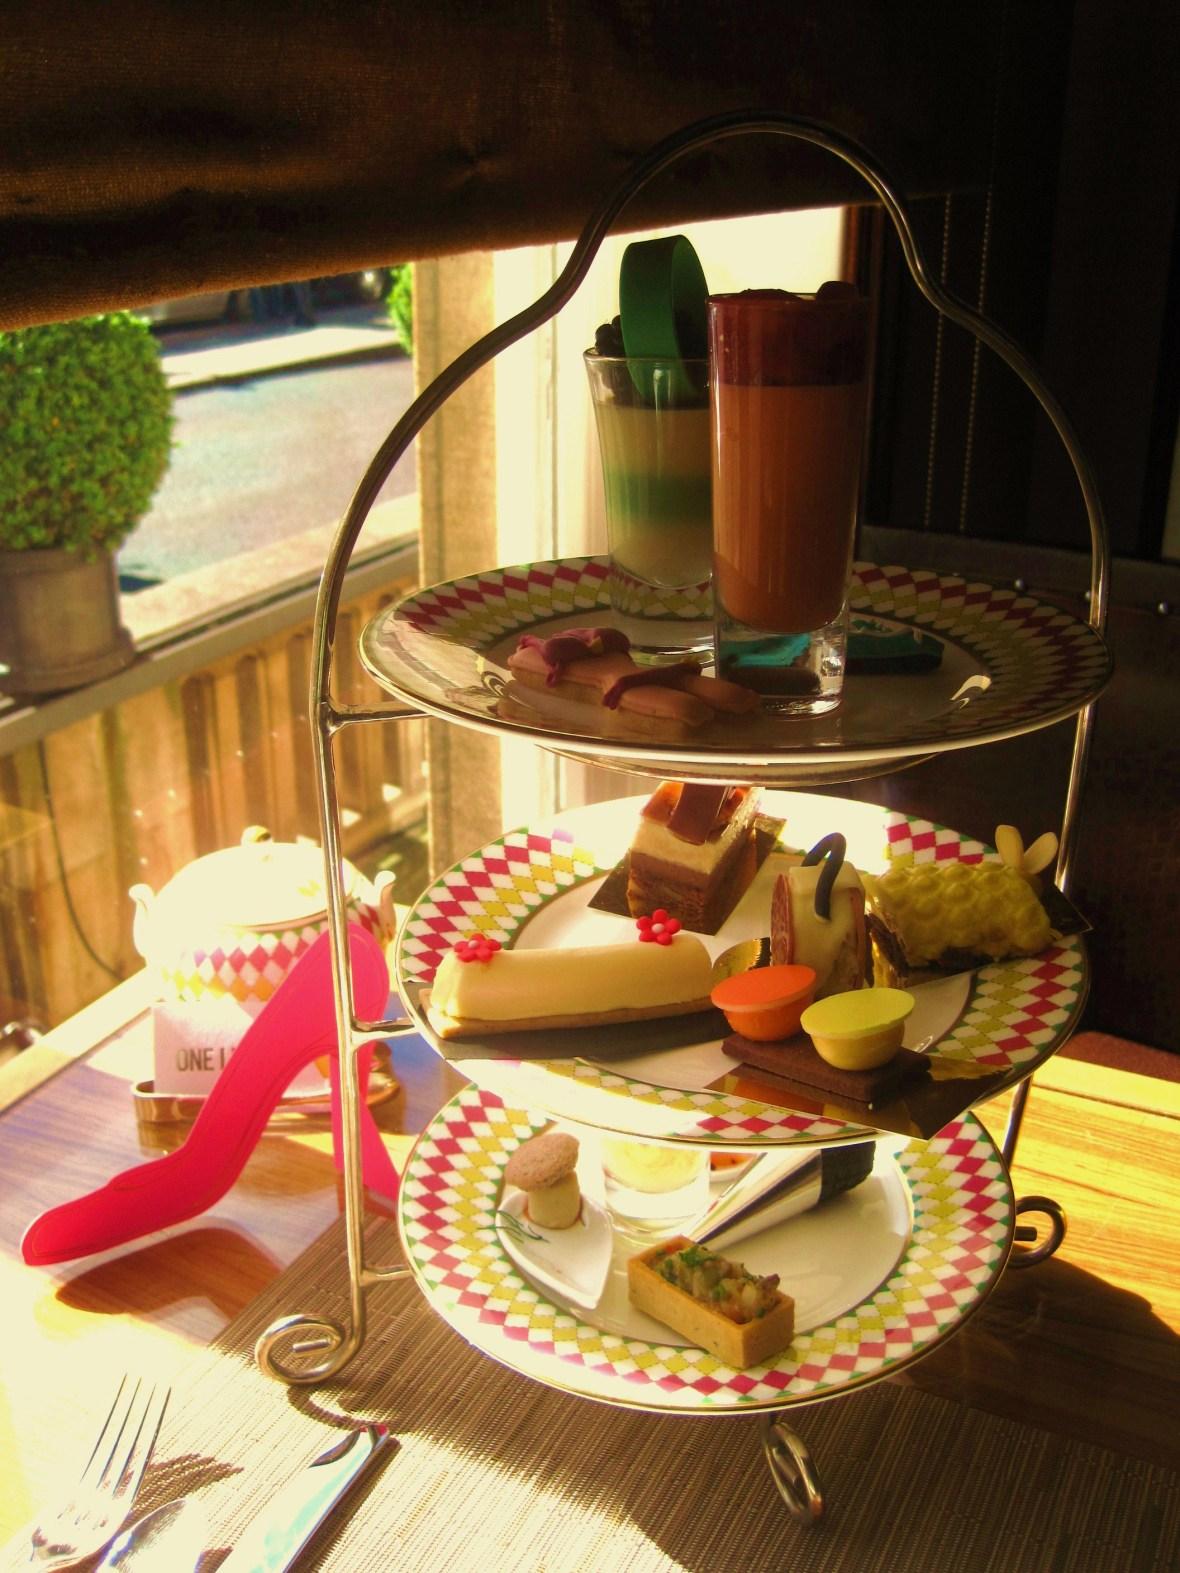 Prêt-à-Portea Afternoon Tea, The Berkeley London - the afternoon tea offering